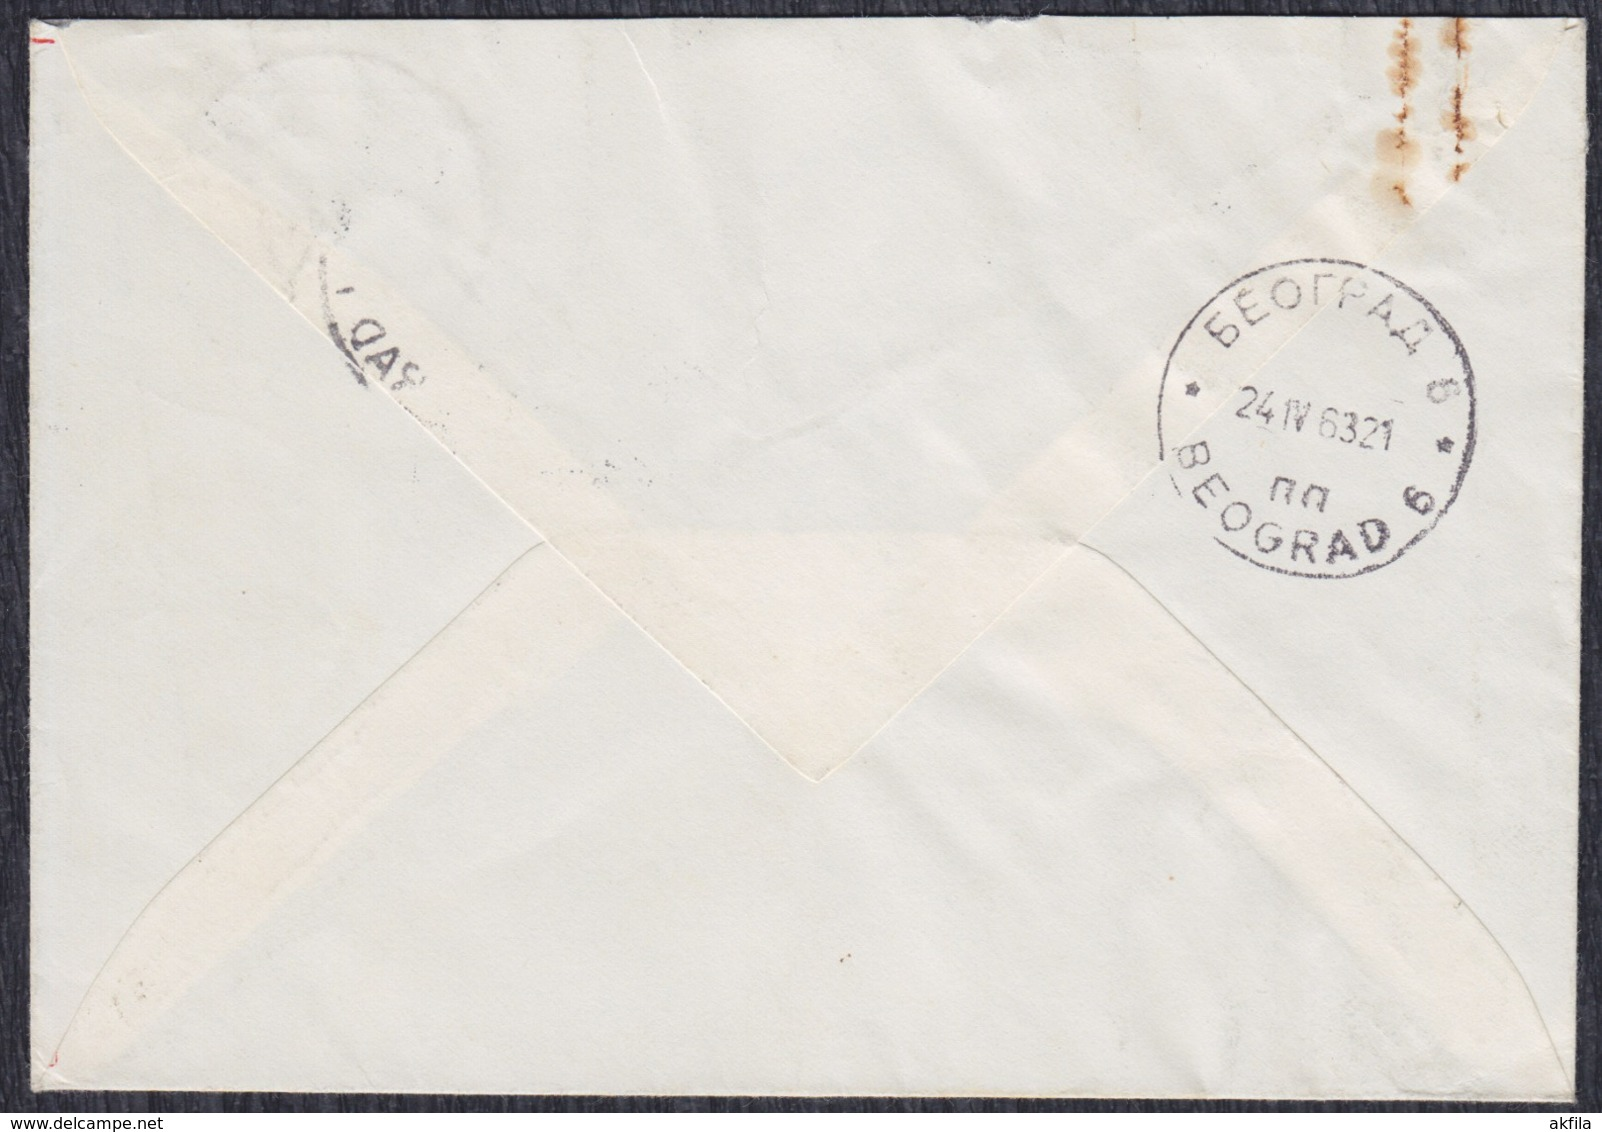 Yugoslavia 1963 Registered Letter Sent To Marshal Josip Broz Tito - Briefe U. Dokumente